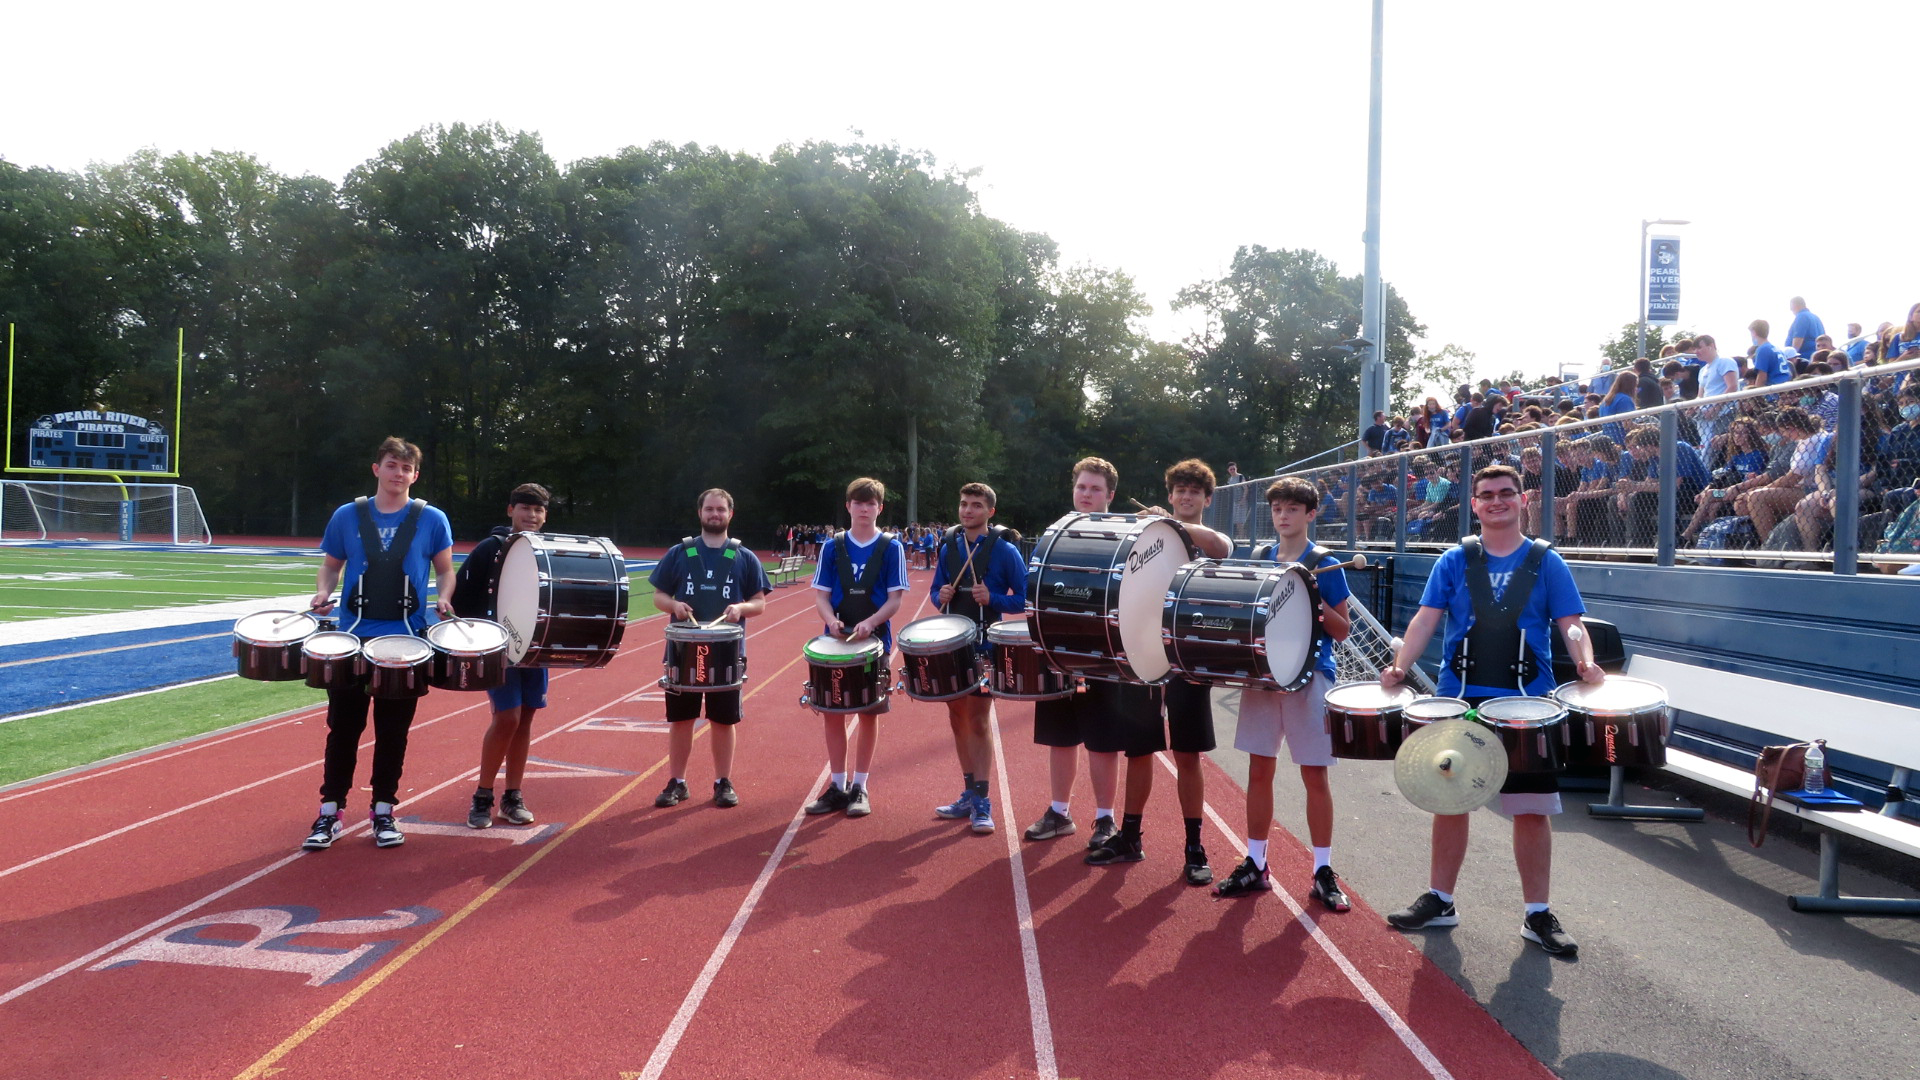 Band students pose at homecoming pep rally outdoors